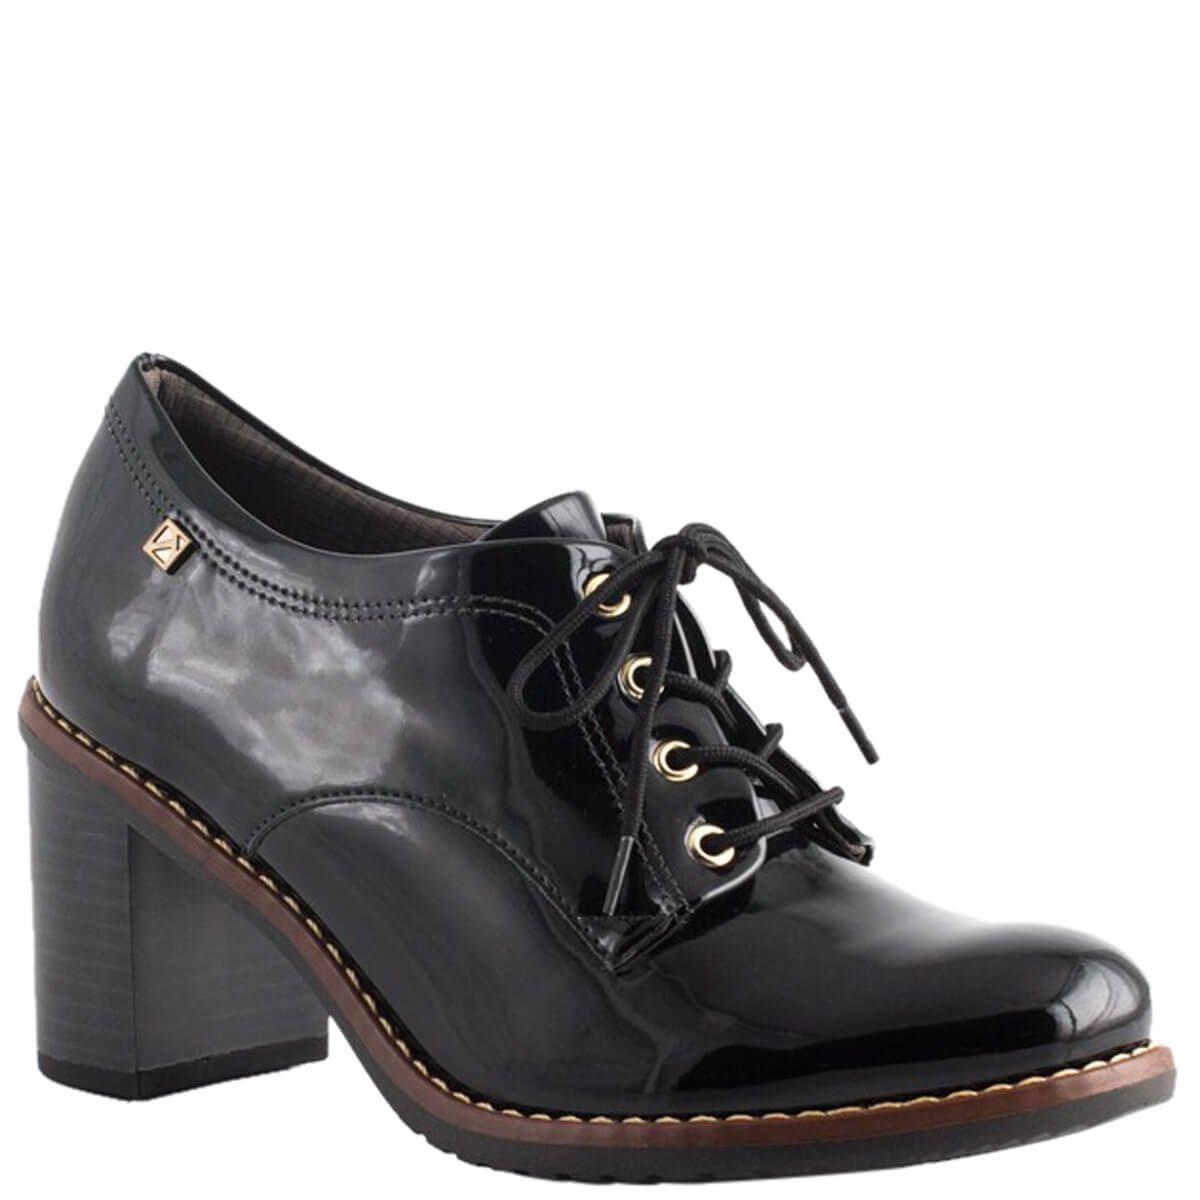 61847df6d Bizz Store - Oxford Feminino Piccadilly Verniz Salto Grosso